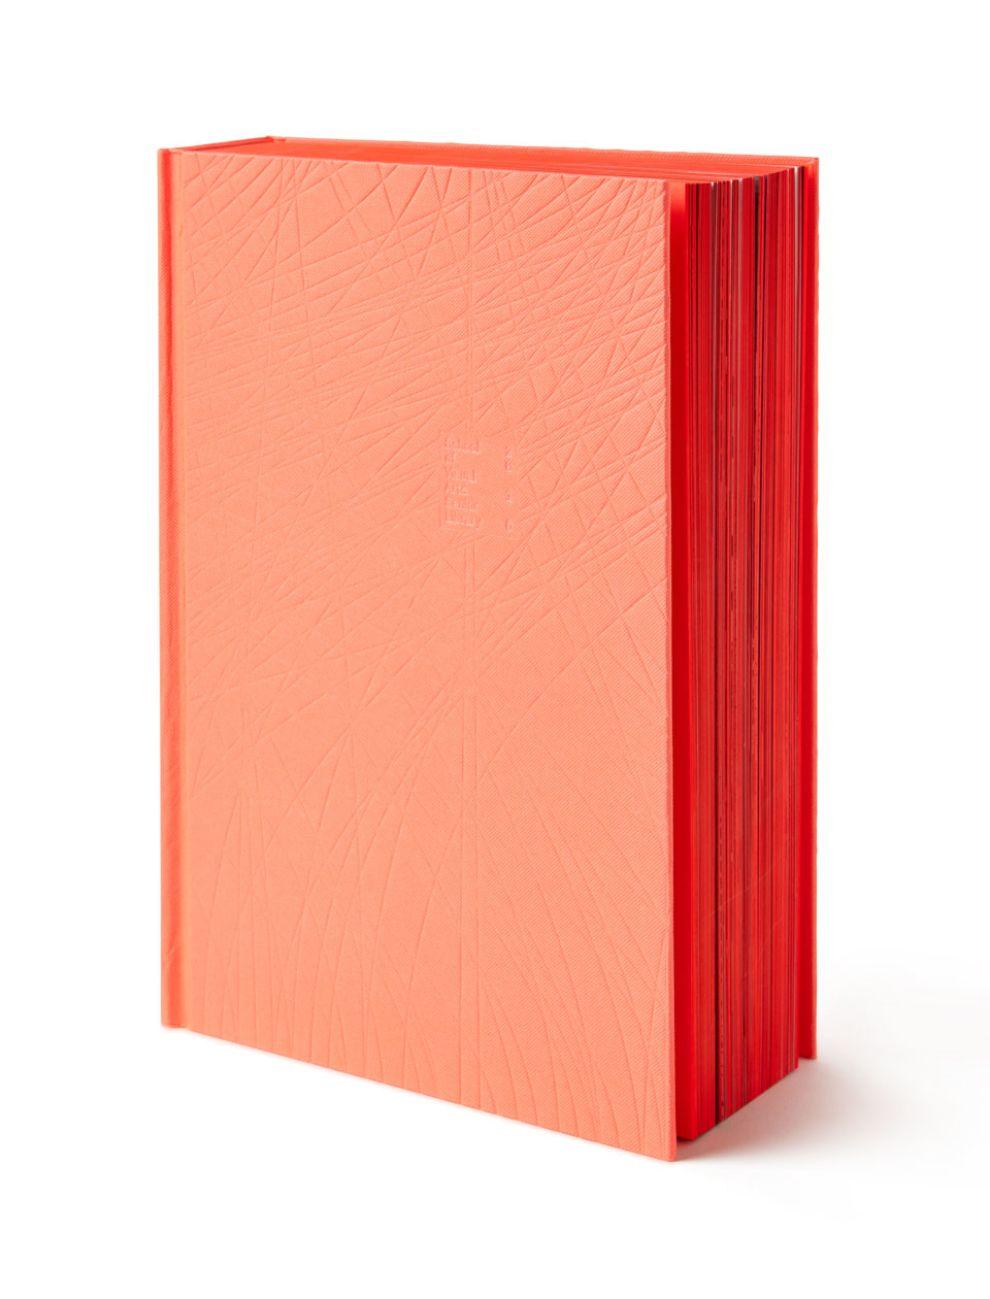 The School of Visual Arts Book Print Design